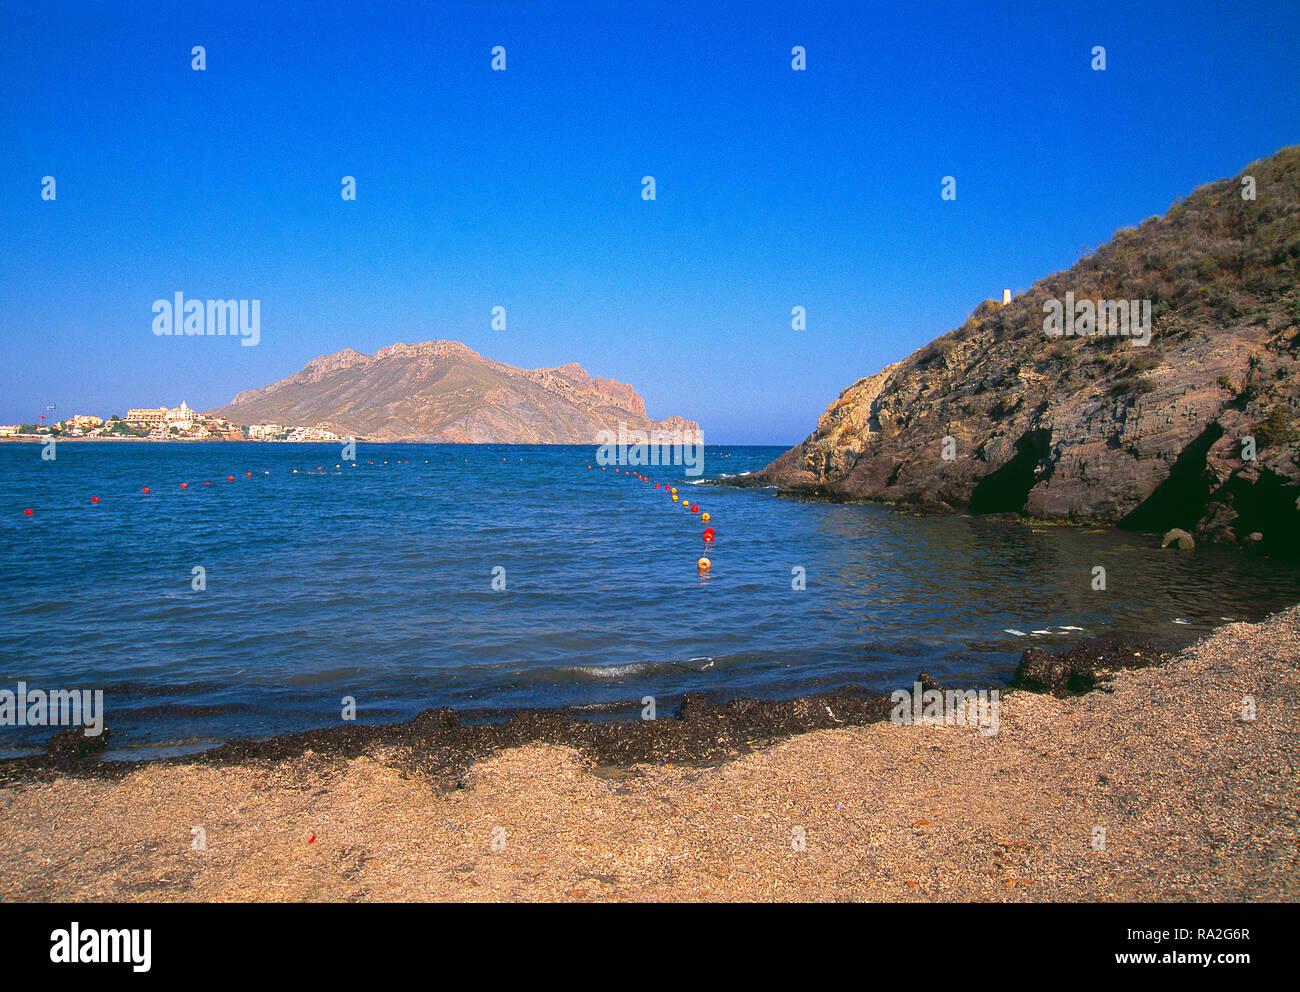 Beach. Cabo Cope y Puntas de Calnegre Nature Reserve, Murcia, Spain. - Stock Image